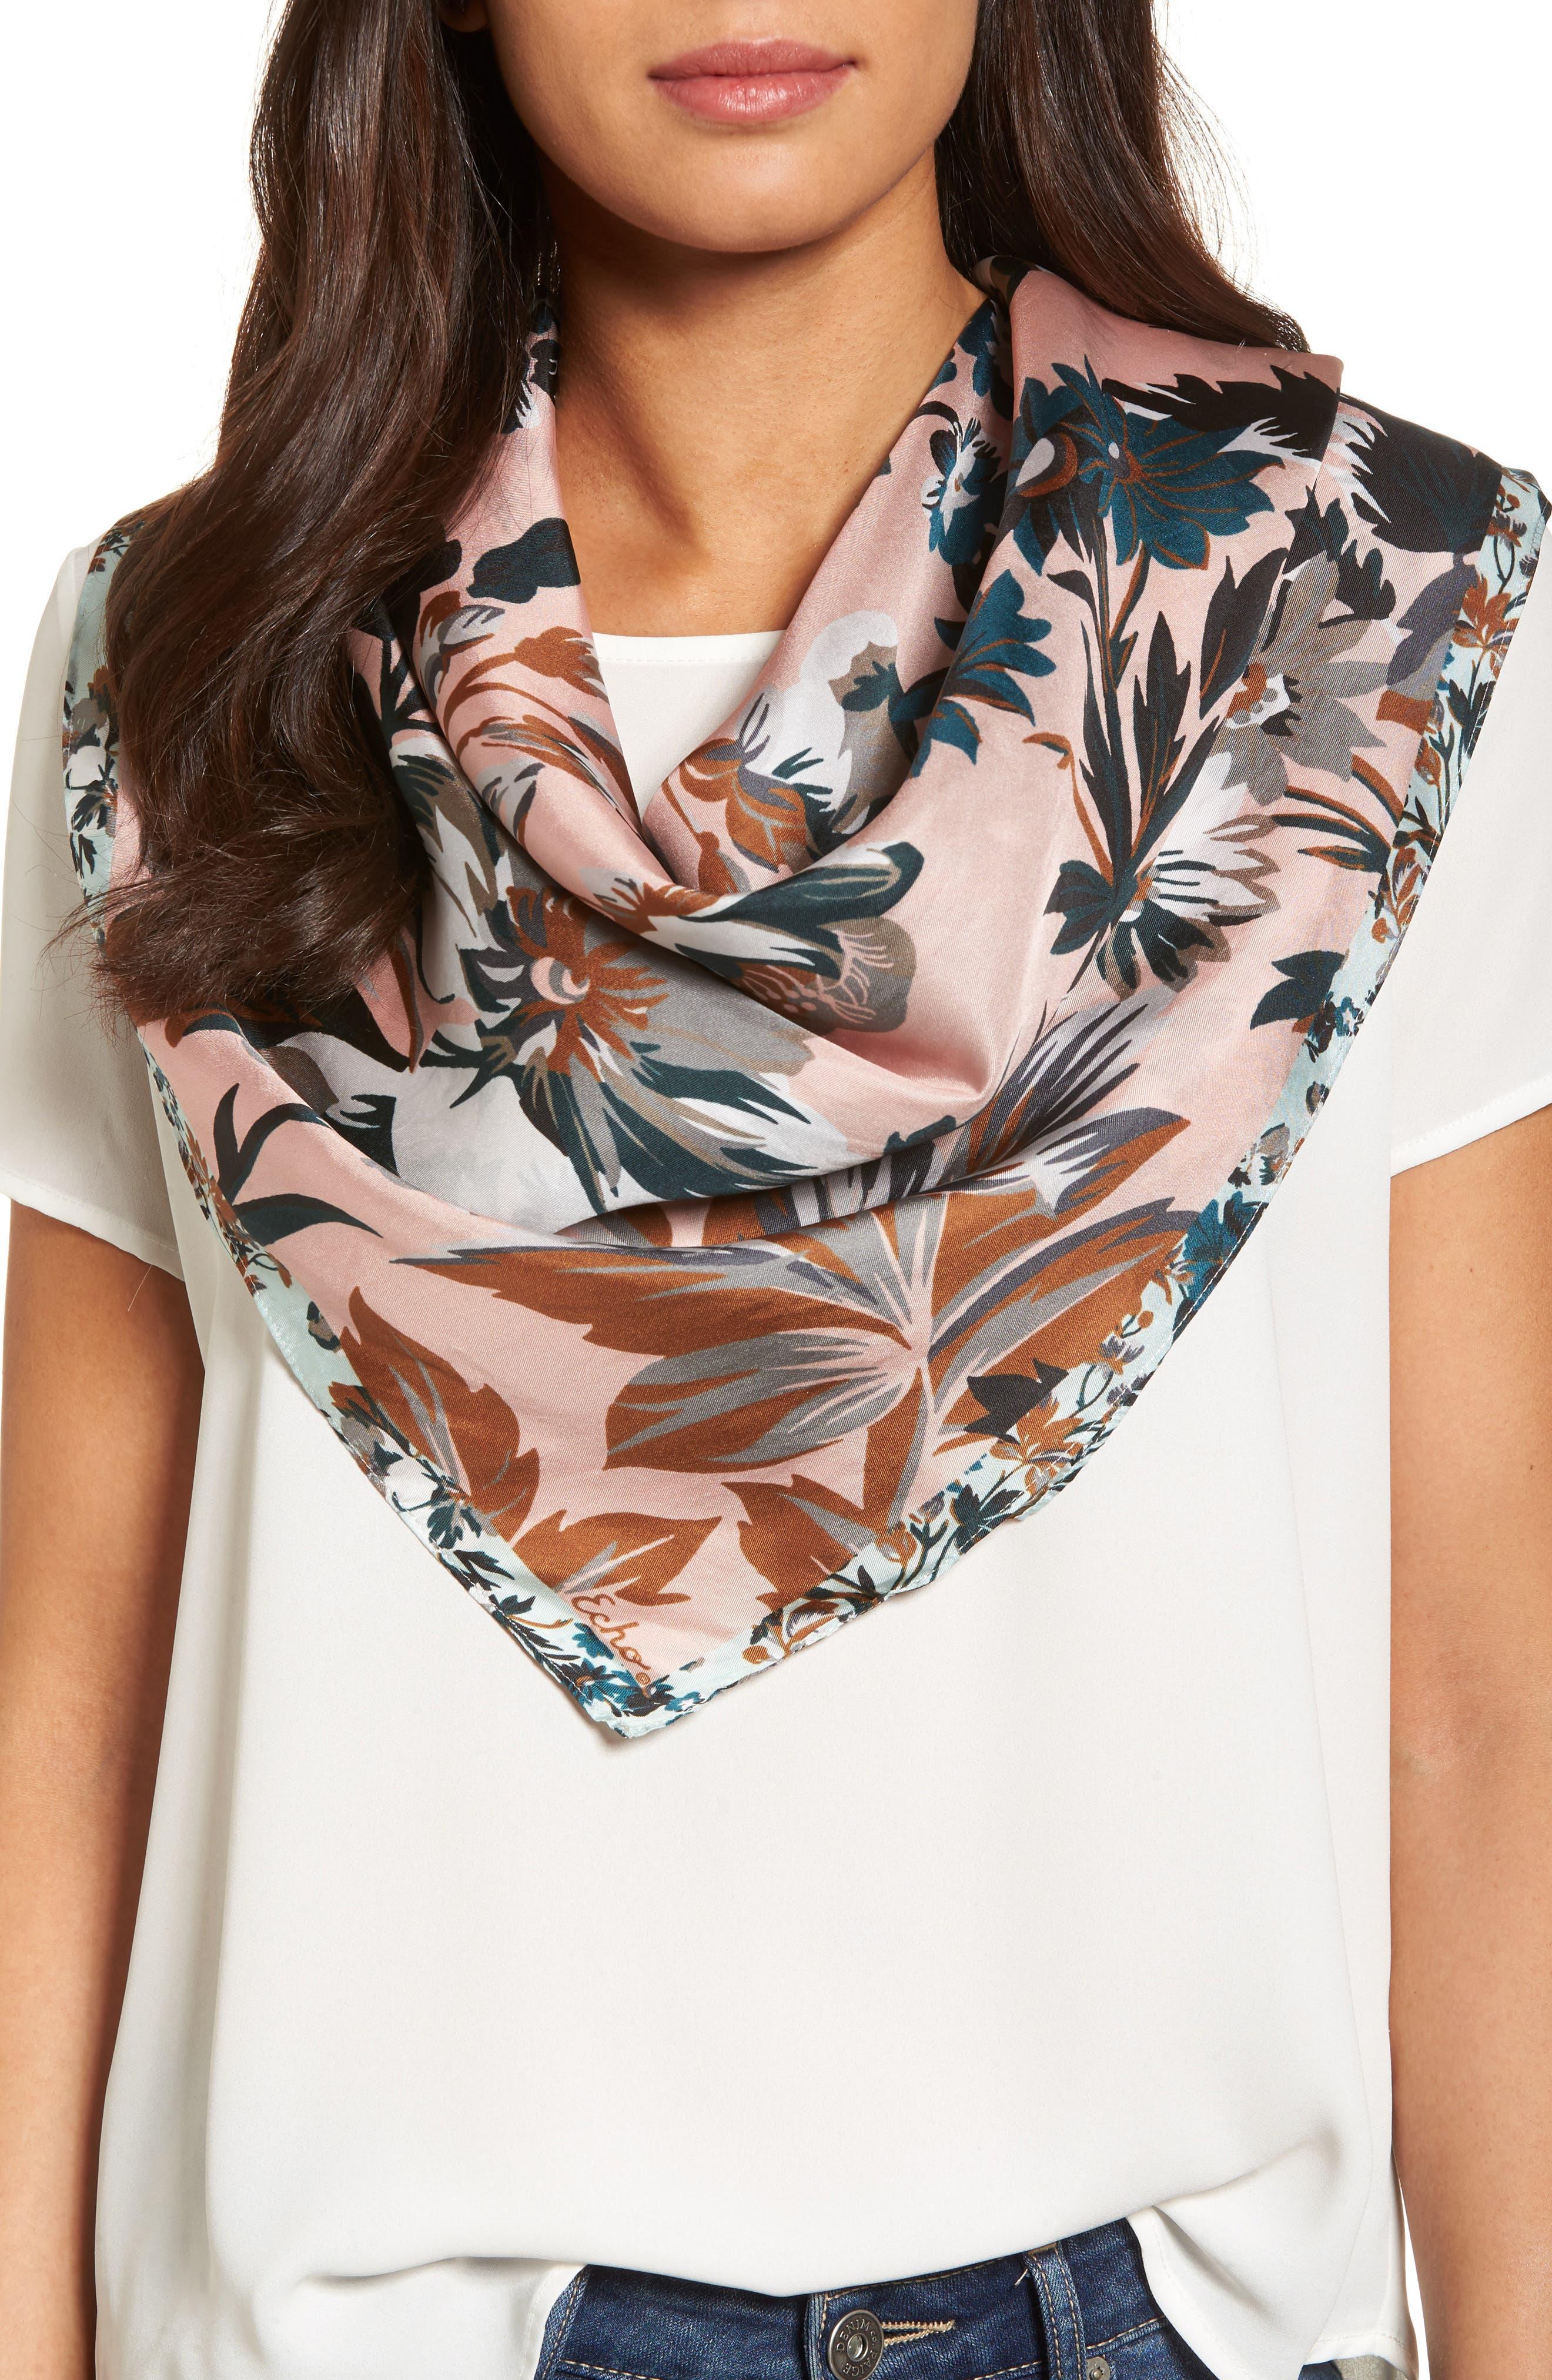 Highgate Floral Square Silk Scarf,                         Main,                         color, 110